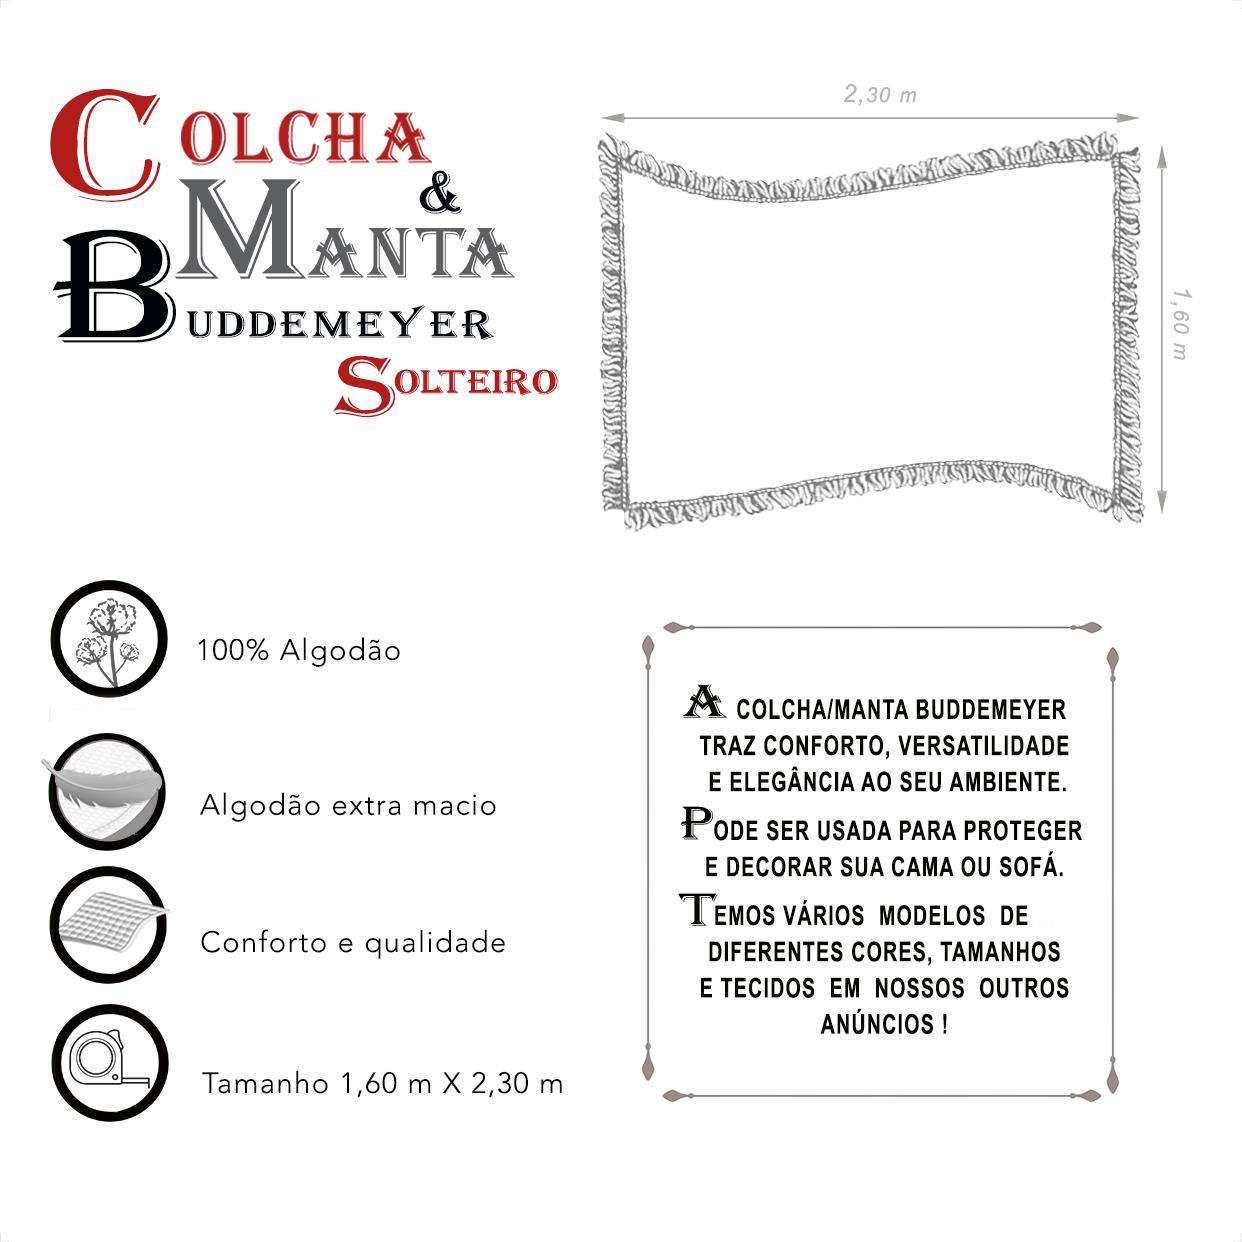 Manta e Colcha Buddemeyer Solteiro Telha 1,60m x 2,30m